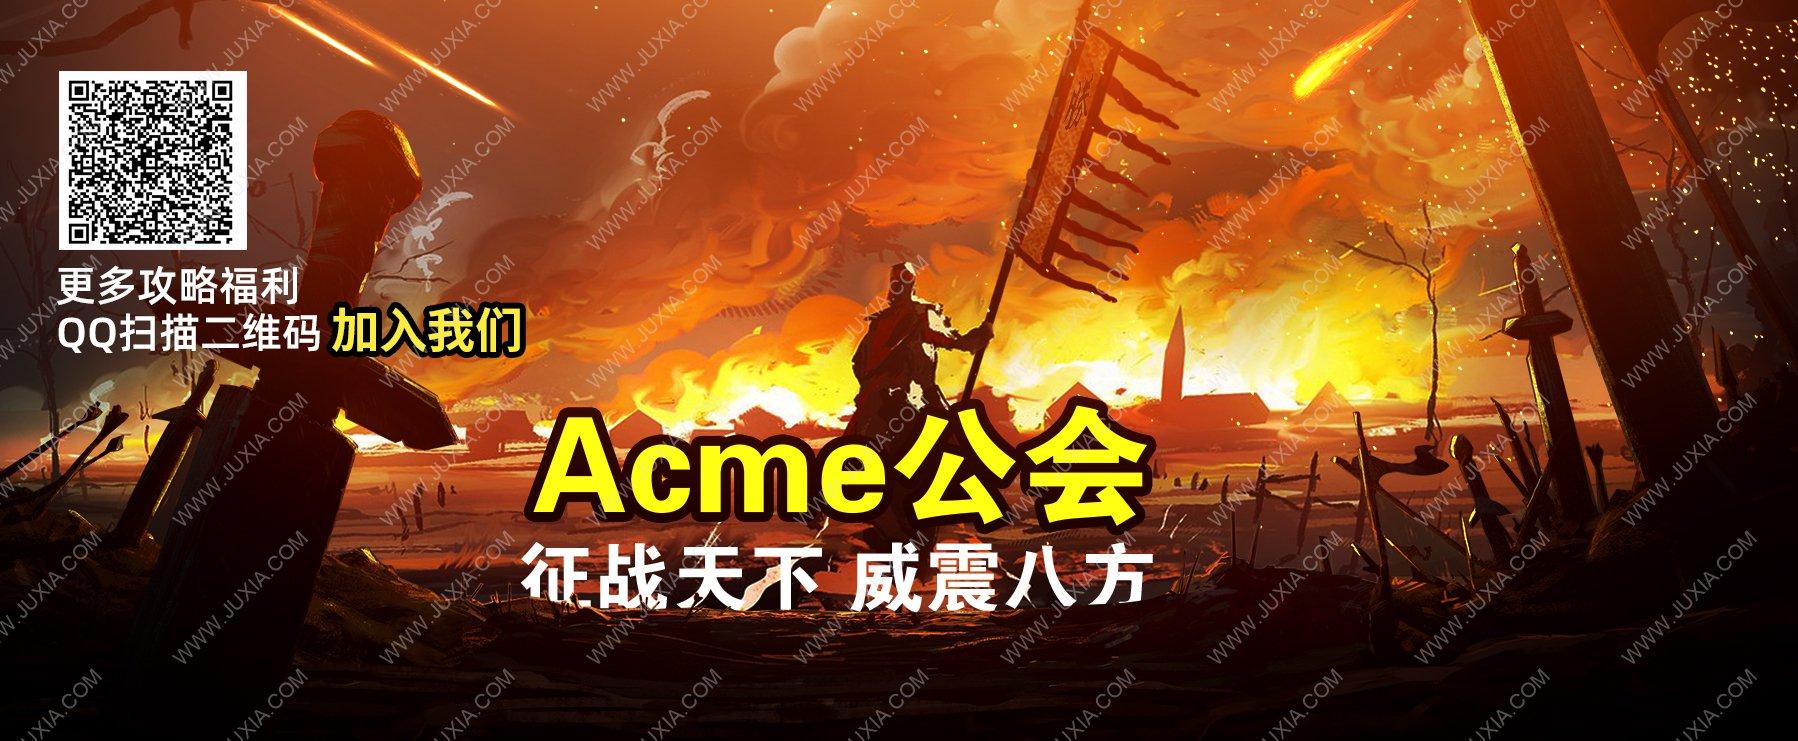 Acme公会招新 卖了魔都的别墅做公会